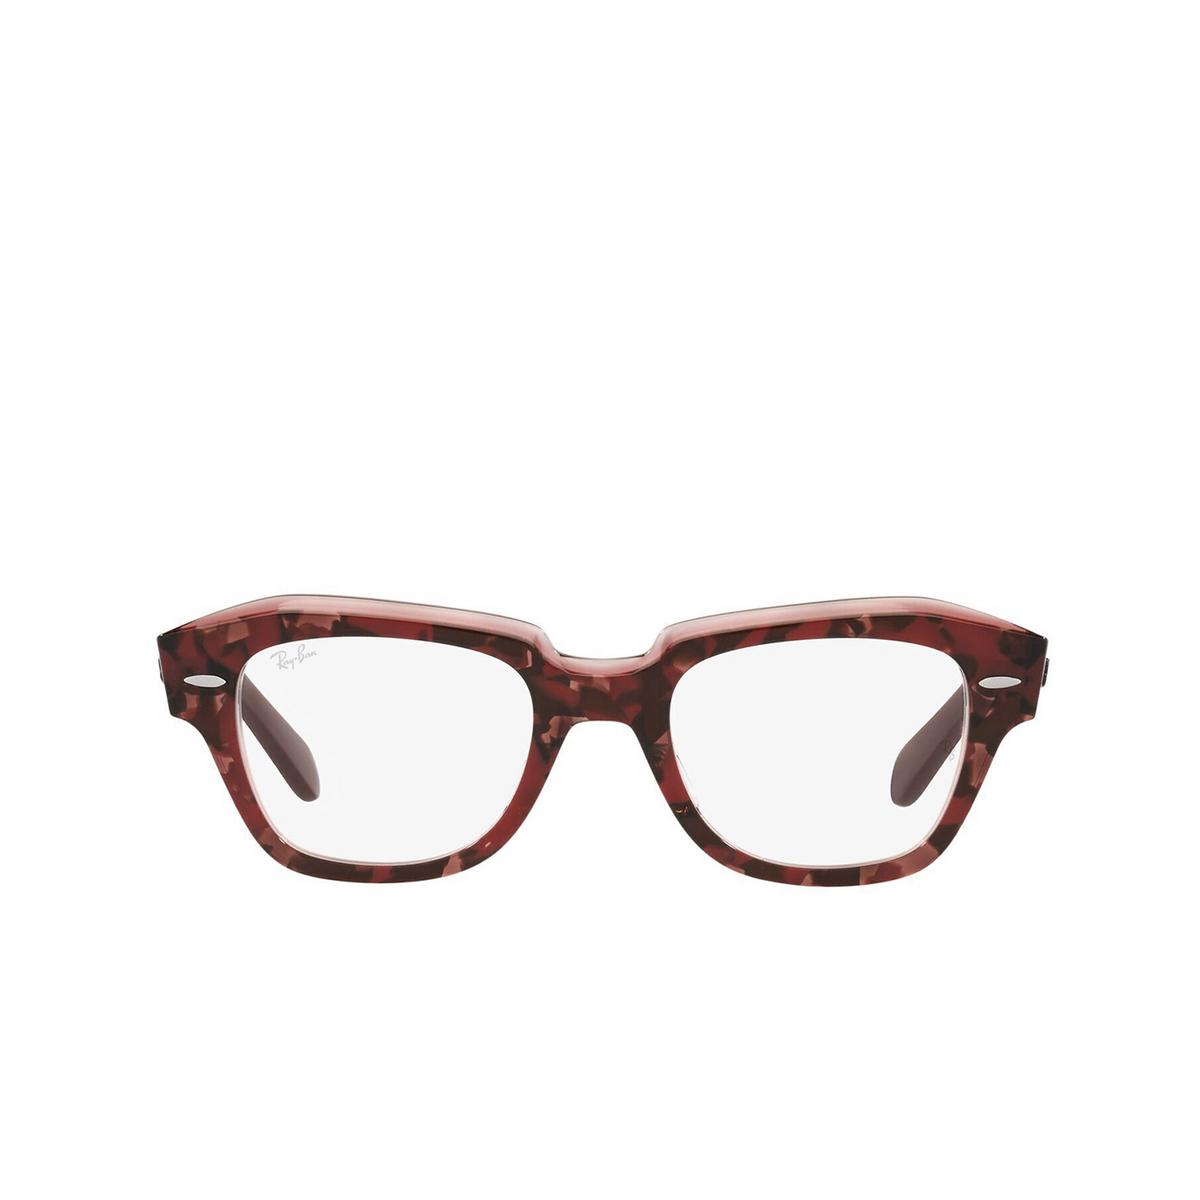 Ray-Ban® Irregular Eyeglasses: State Street RX5486 color Havana On Transparent Purple 8097 - front view.